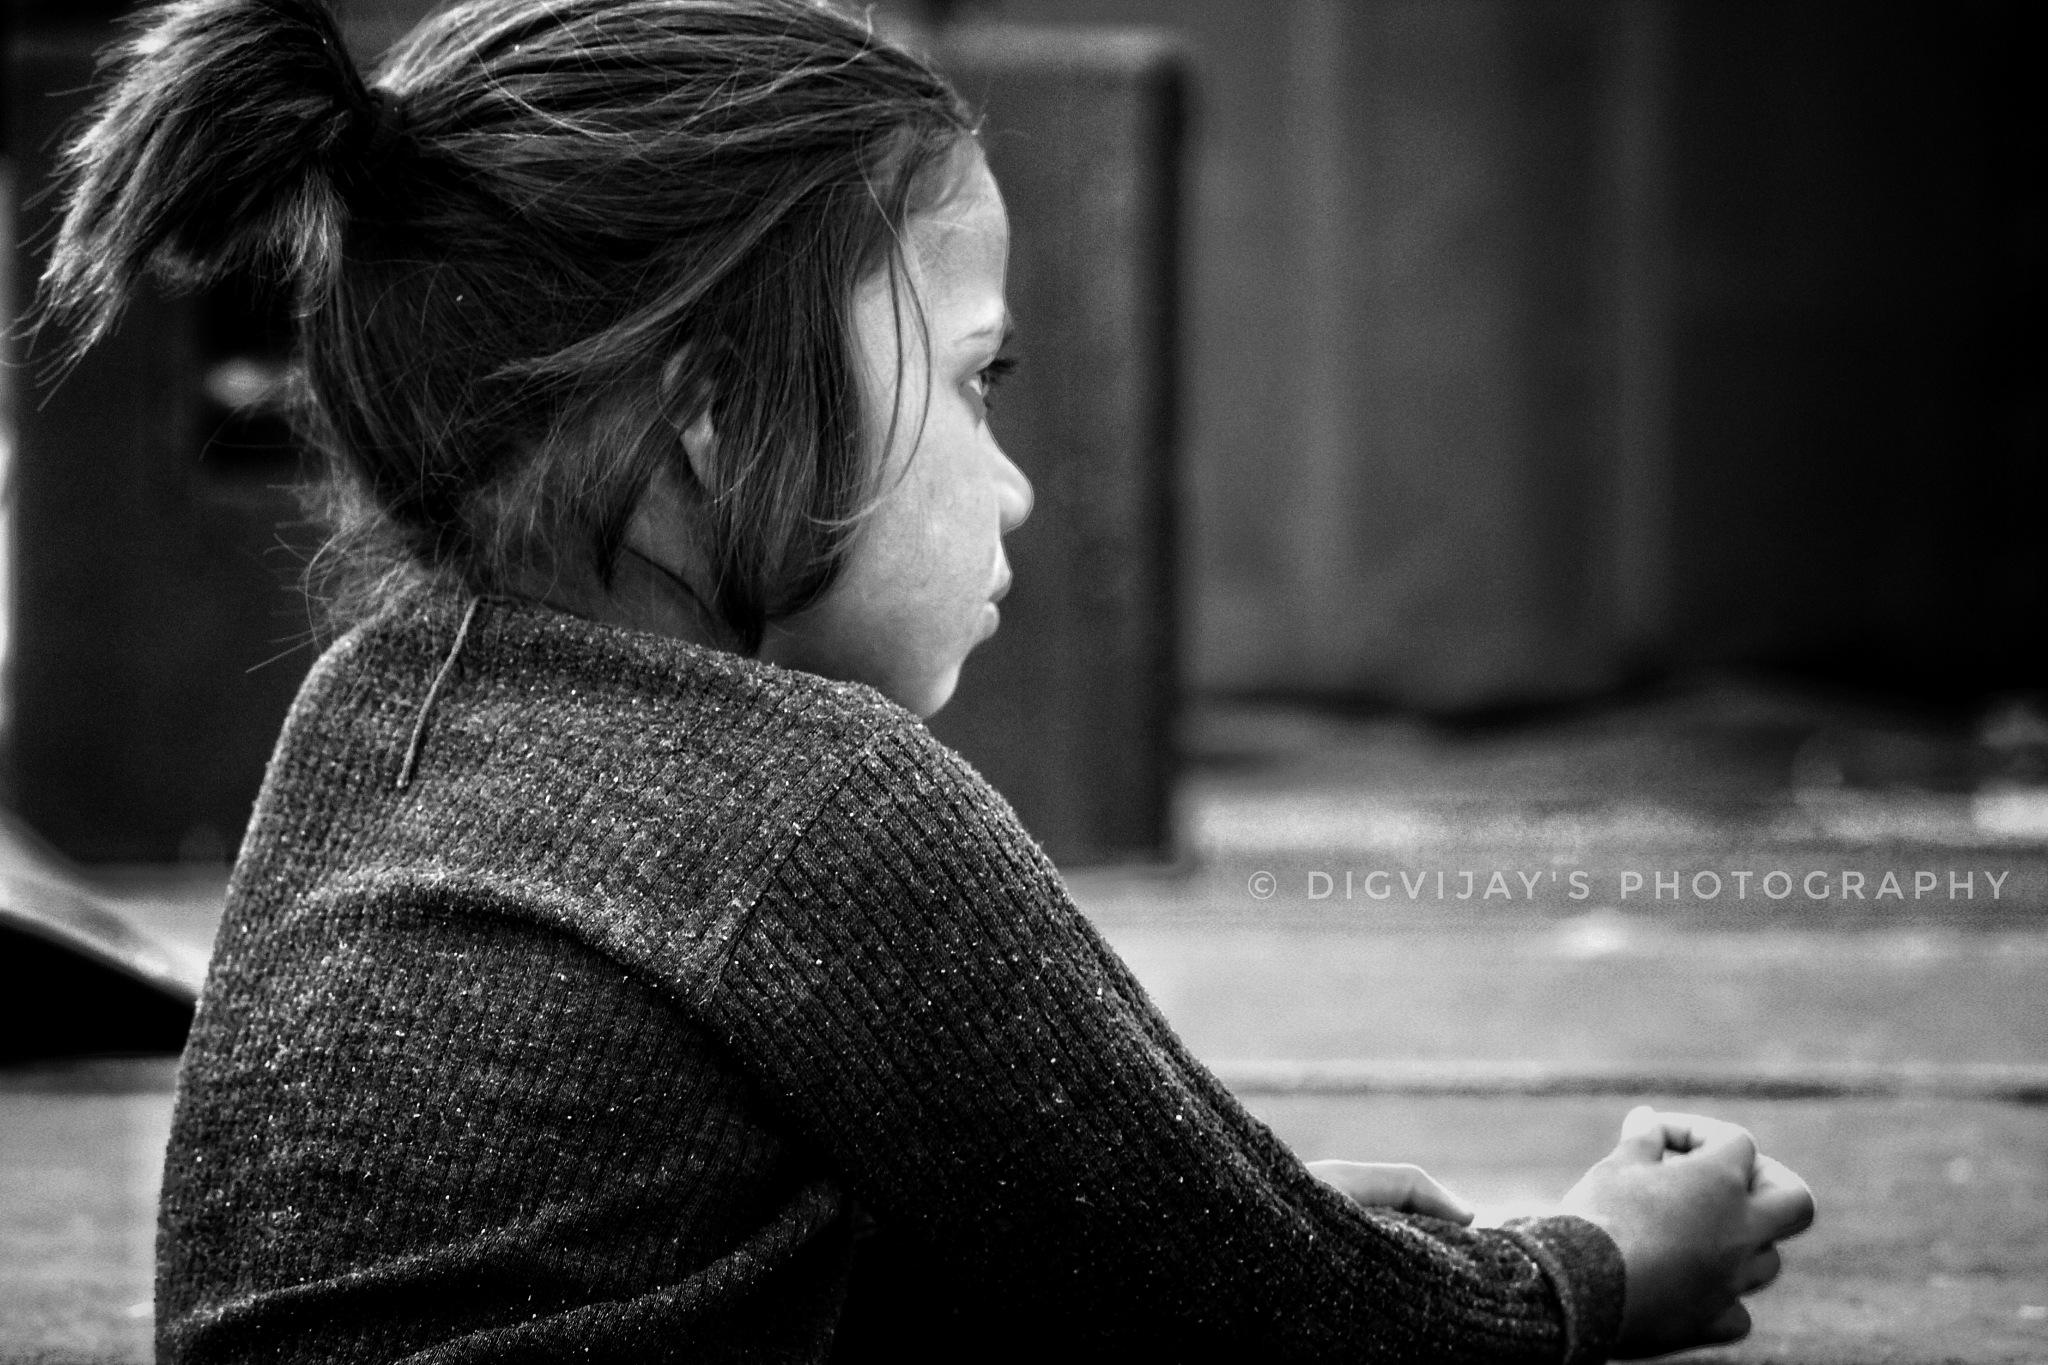 Serious Innocence by Digvijay Khatri